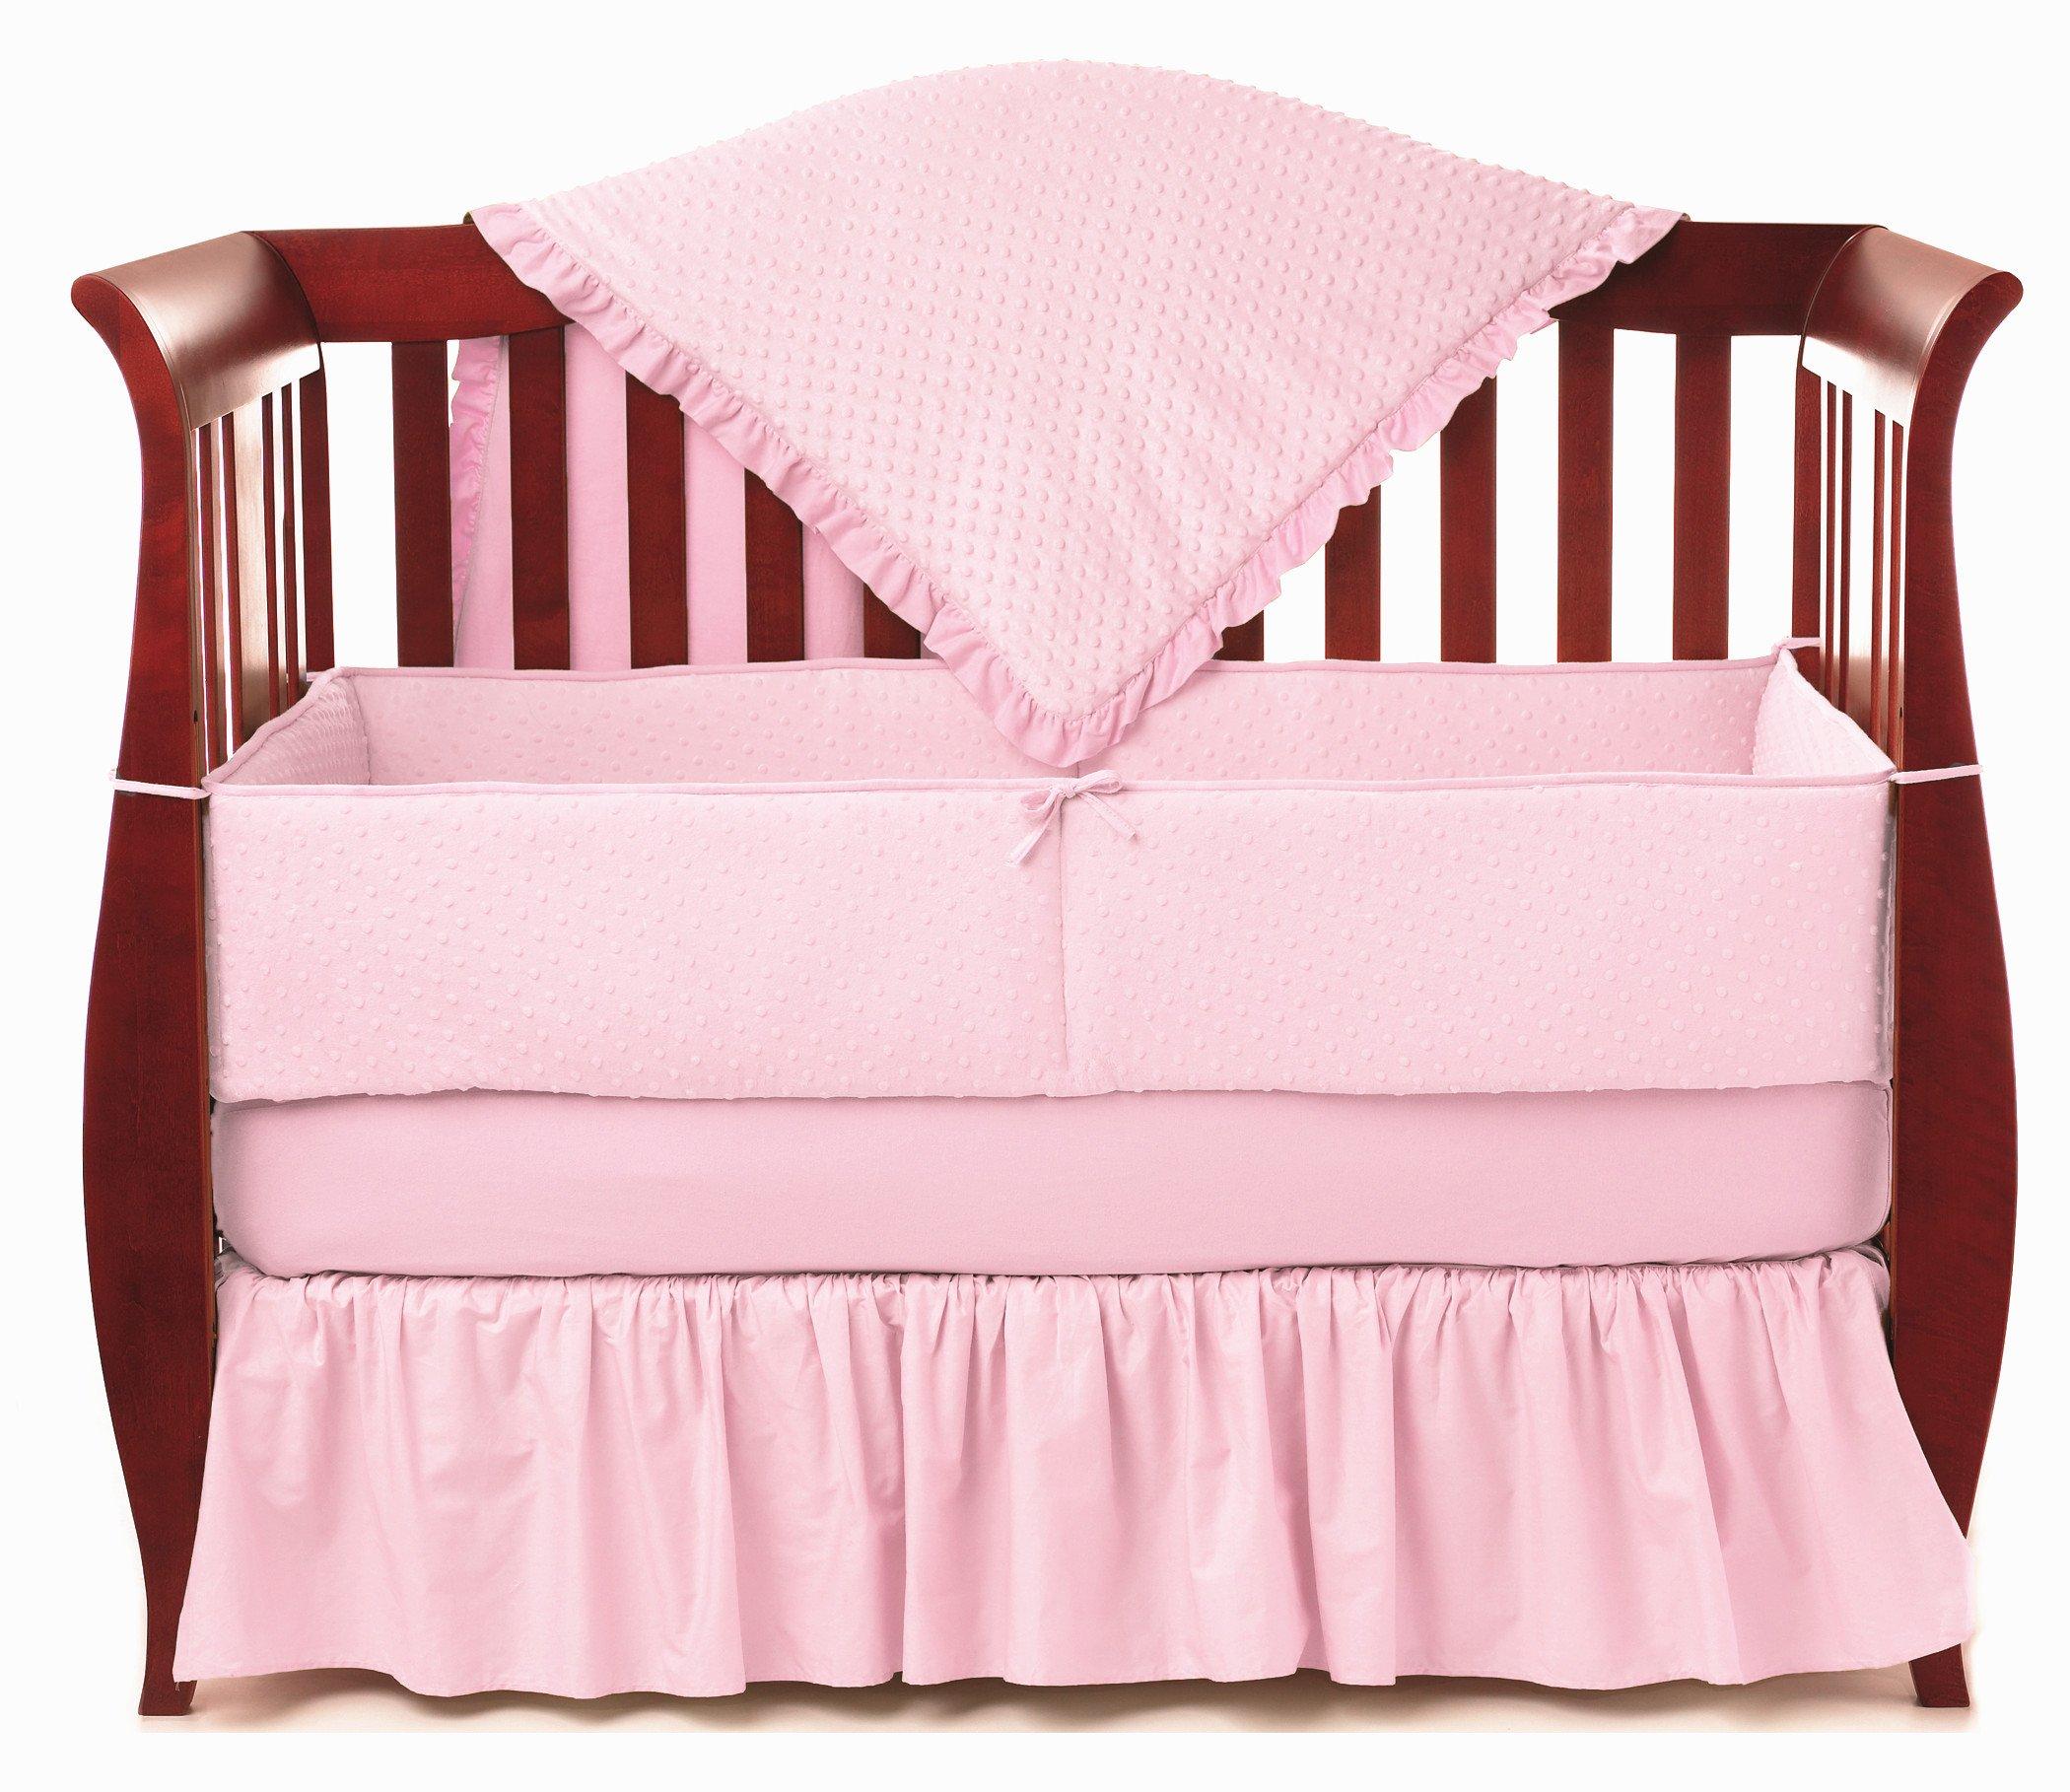 American Baby Company Heavenly Soft Minky Dot 4-Piece Crib Bedding Set, Pink